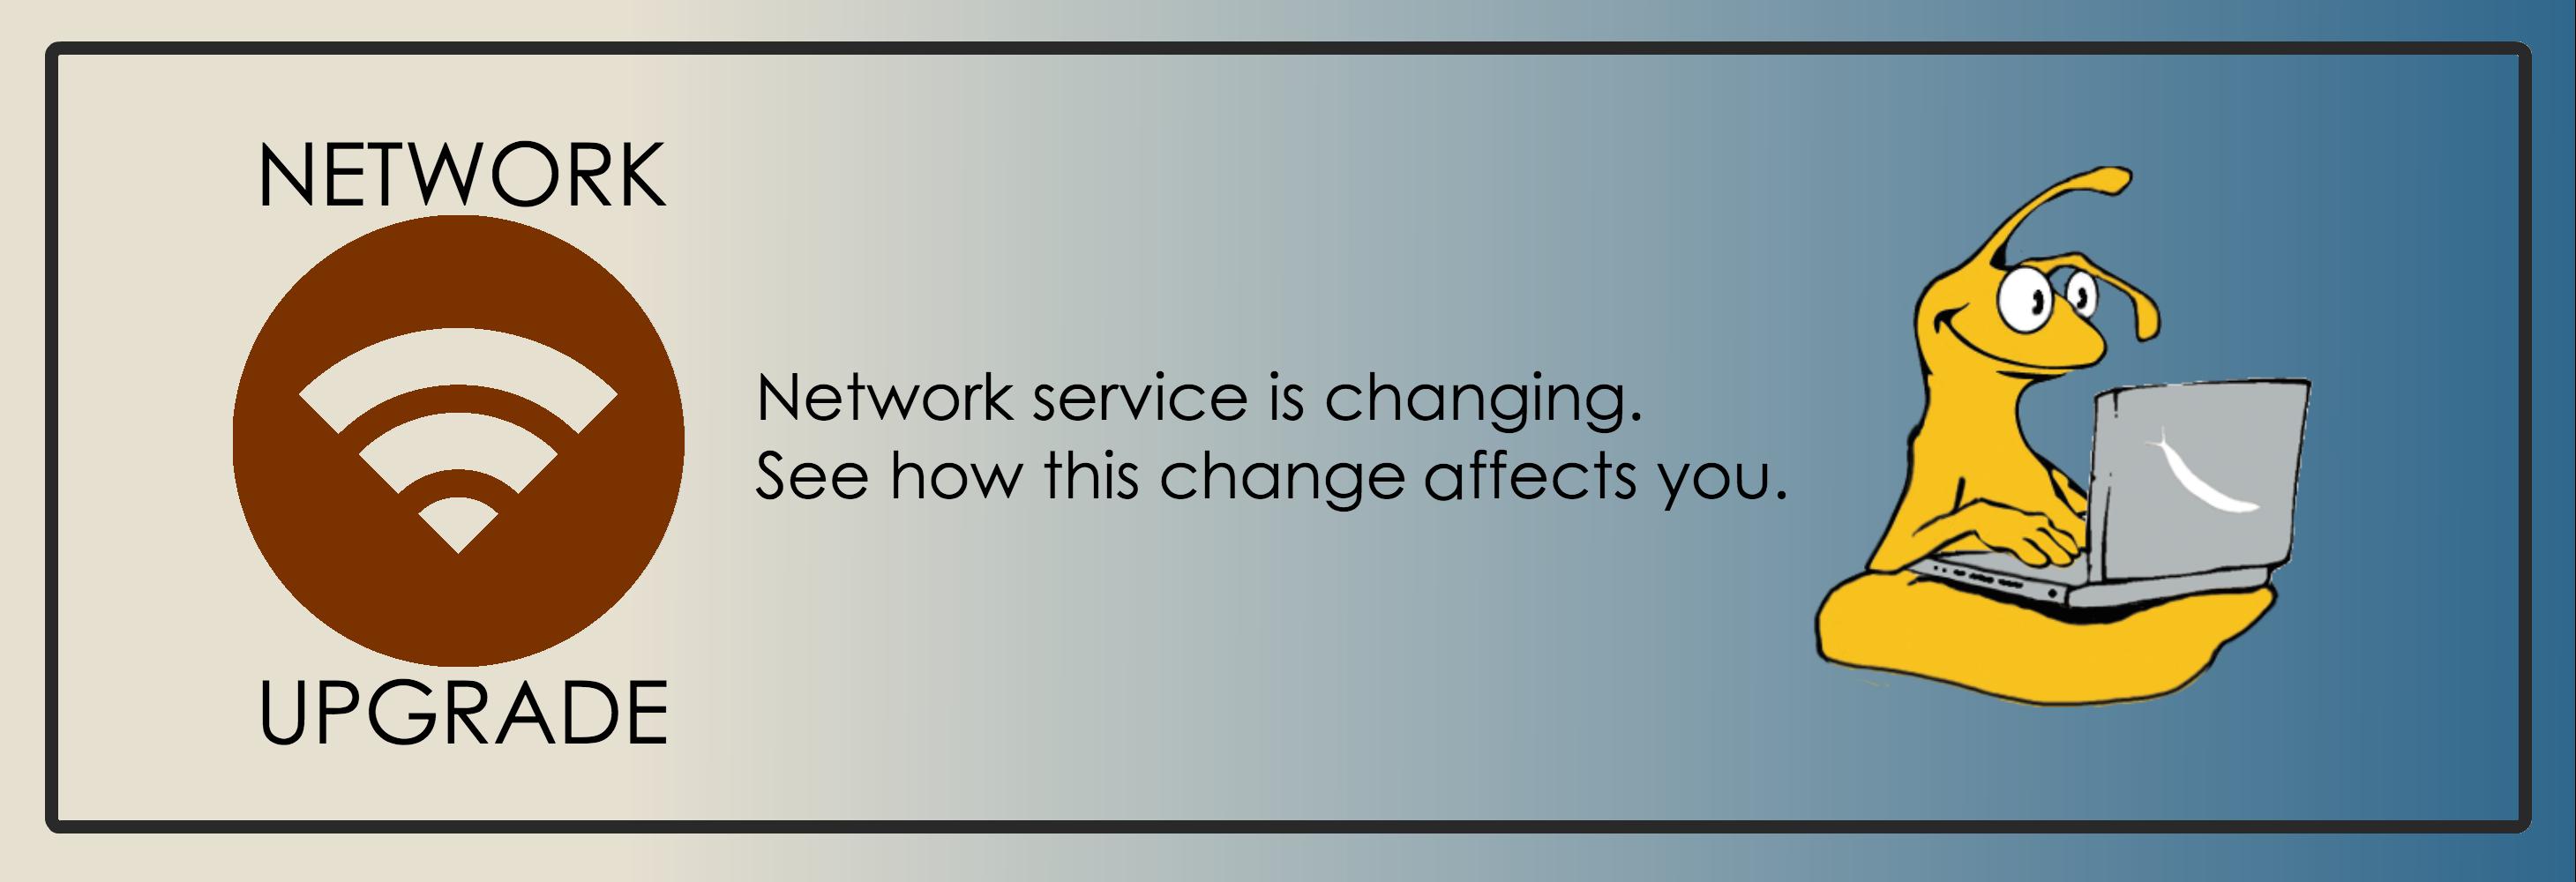 Network Upgrade Banner 2